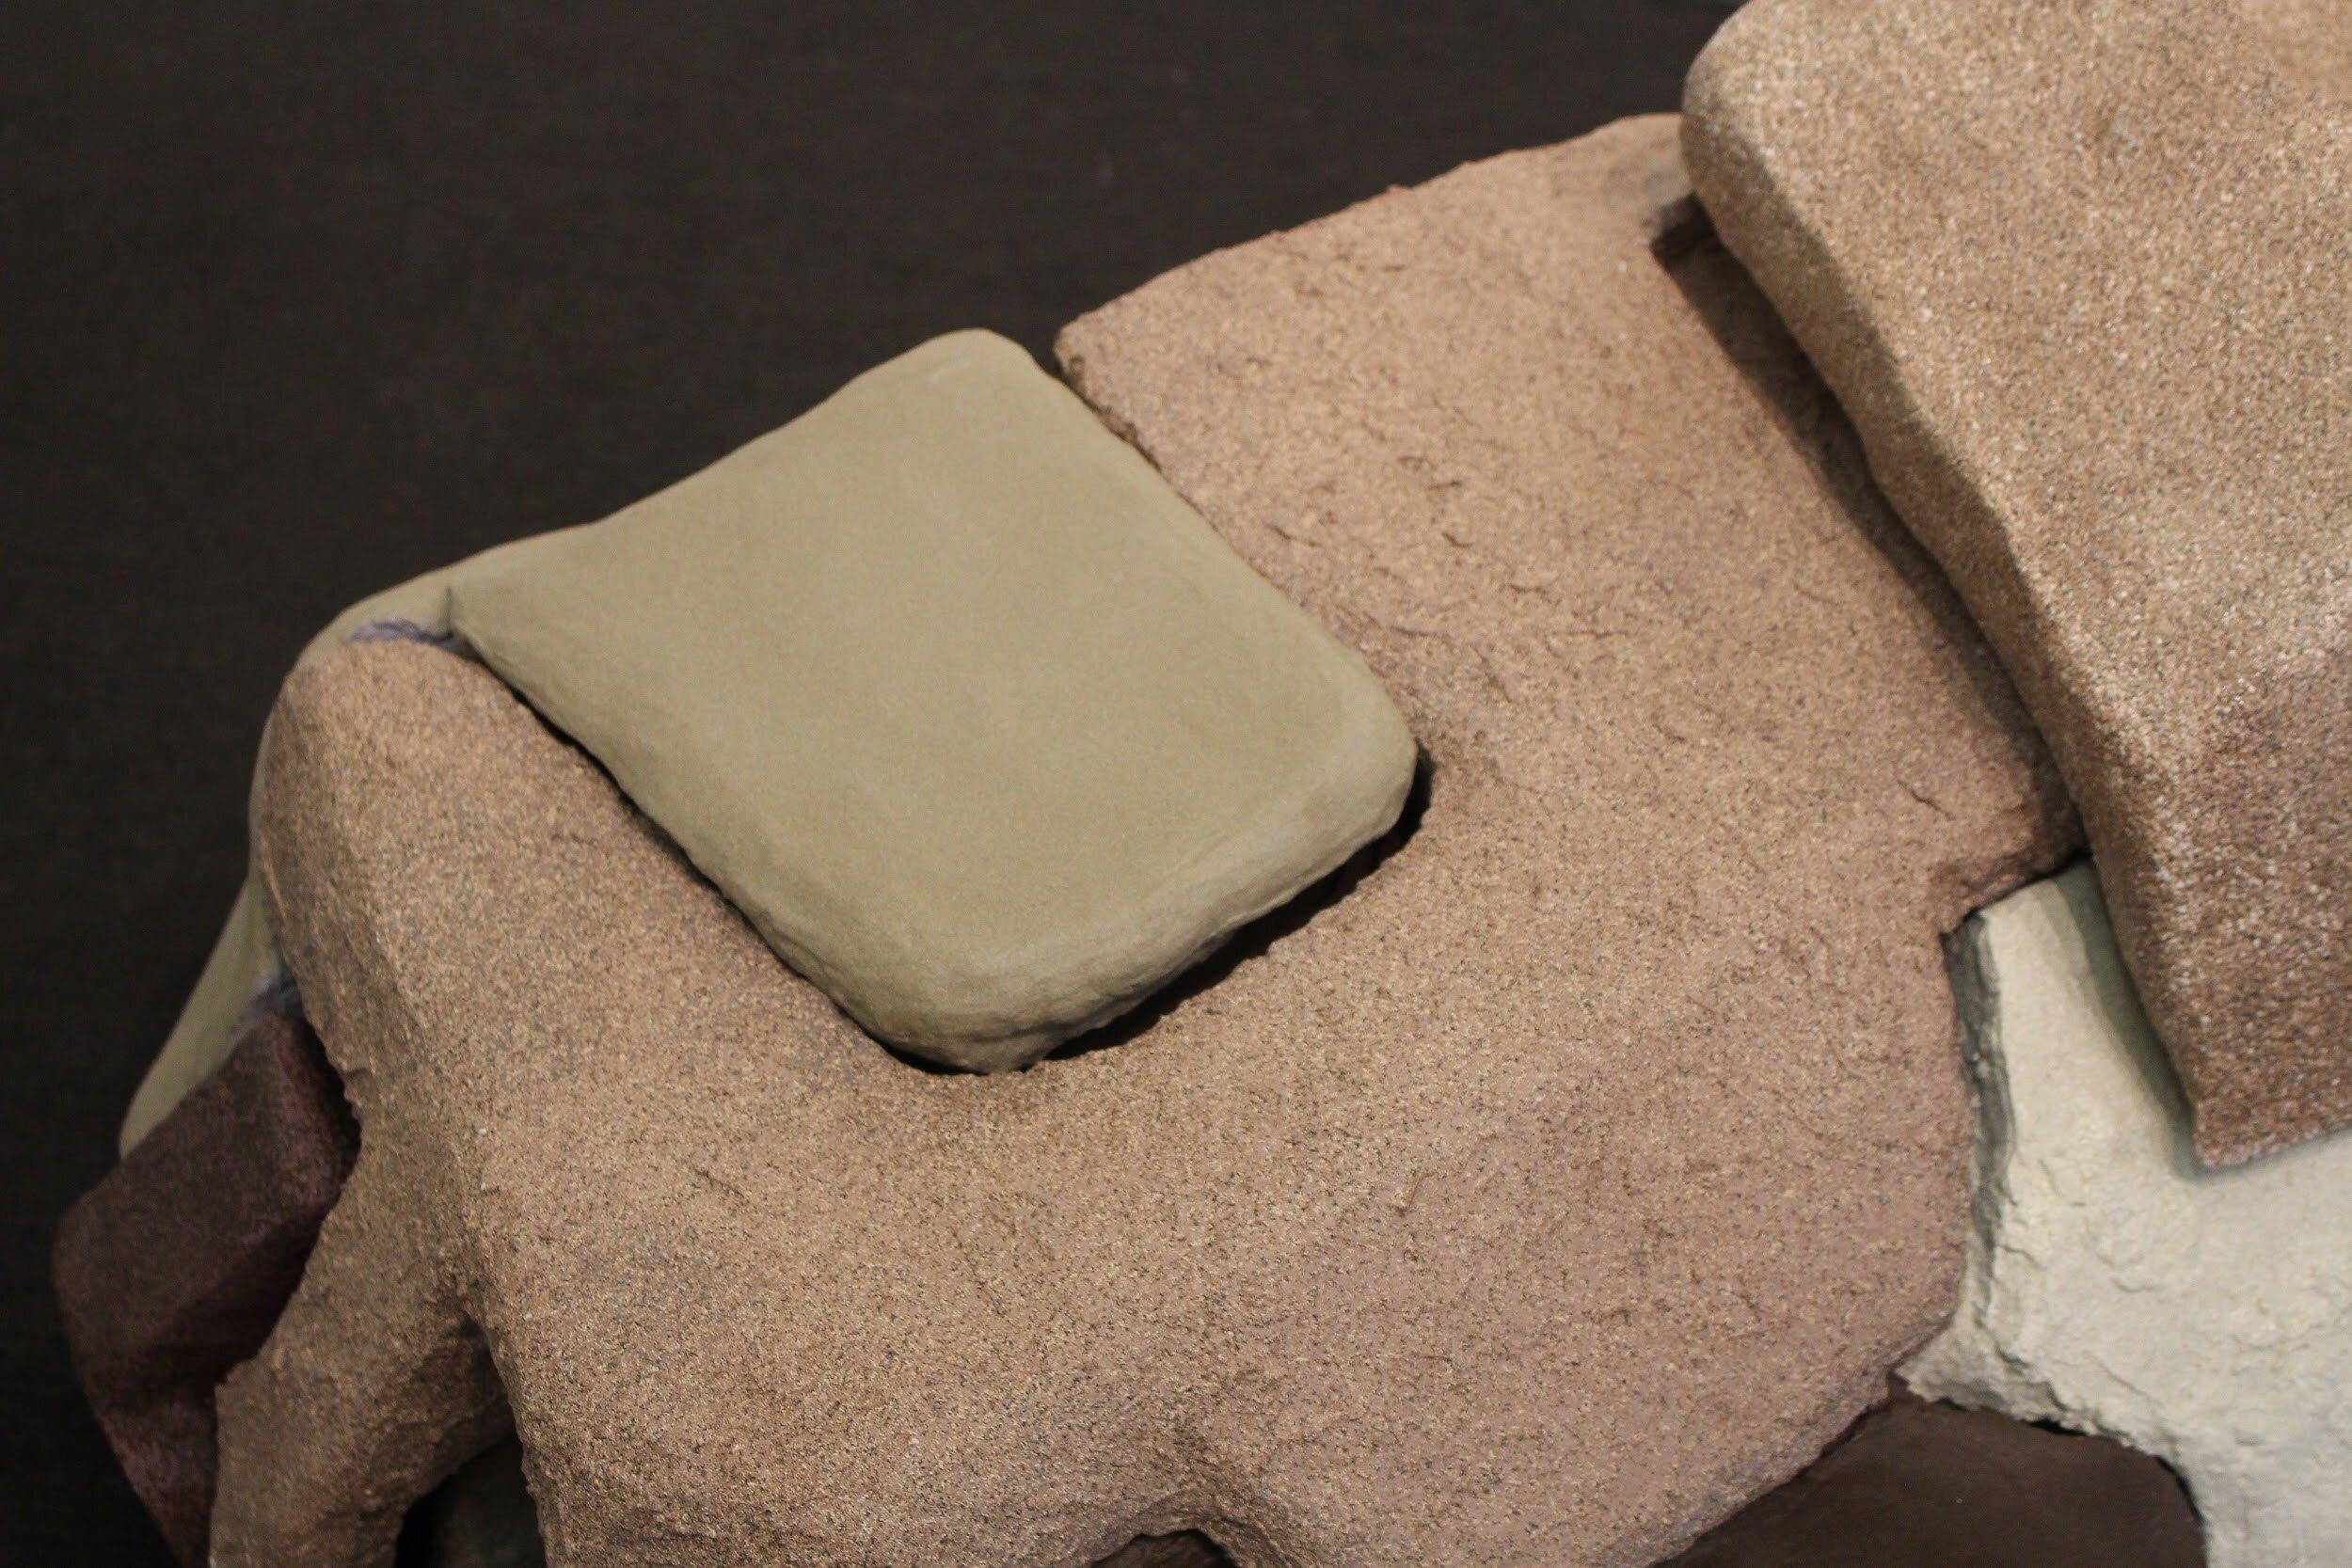 Multi Textured Blissed Dessert  (detail), Vacuum cleaner, cardboard, joint compound, spray paint, carpet, Susana Oliveros Amaya, 2019.